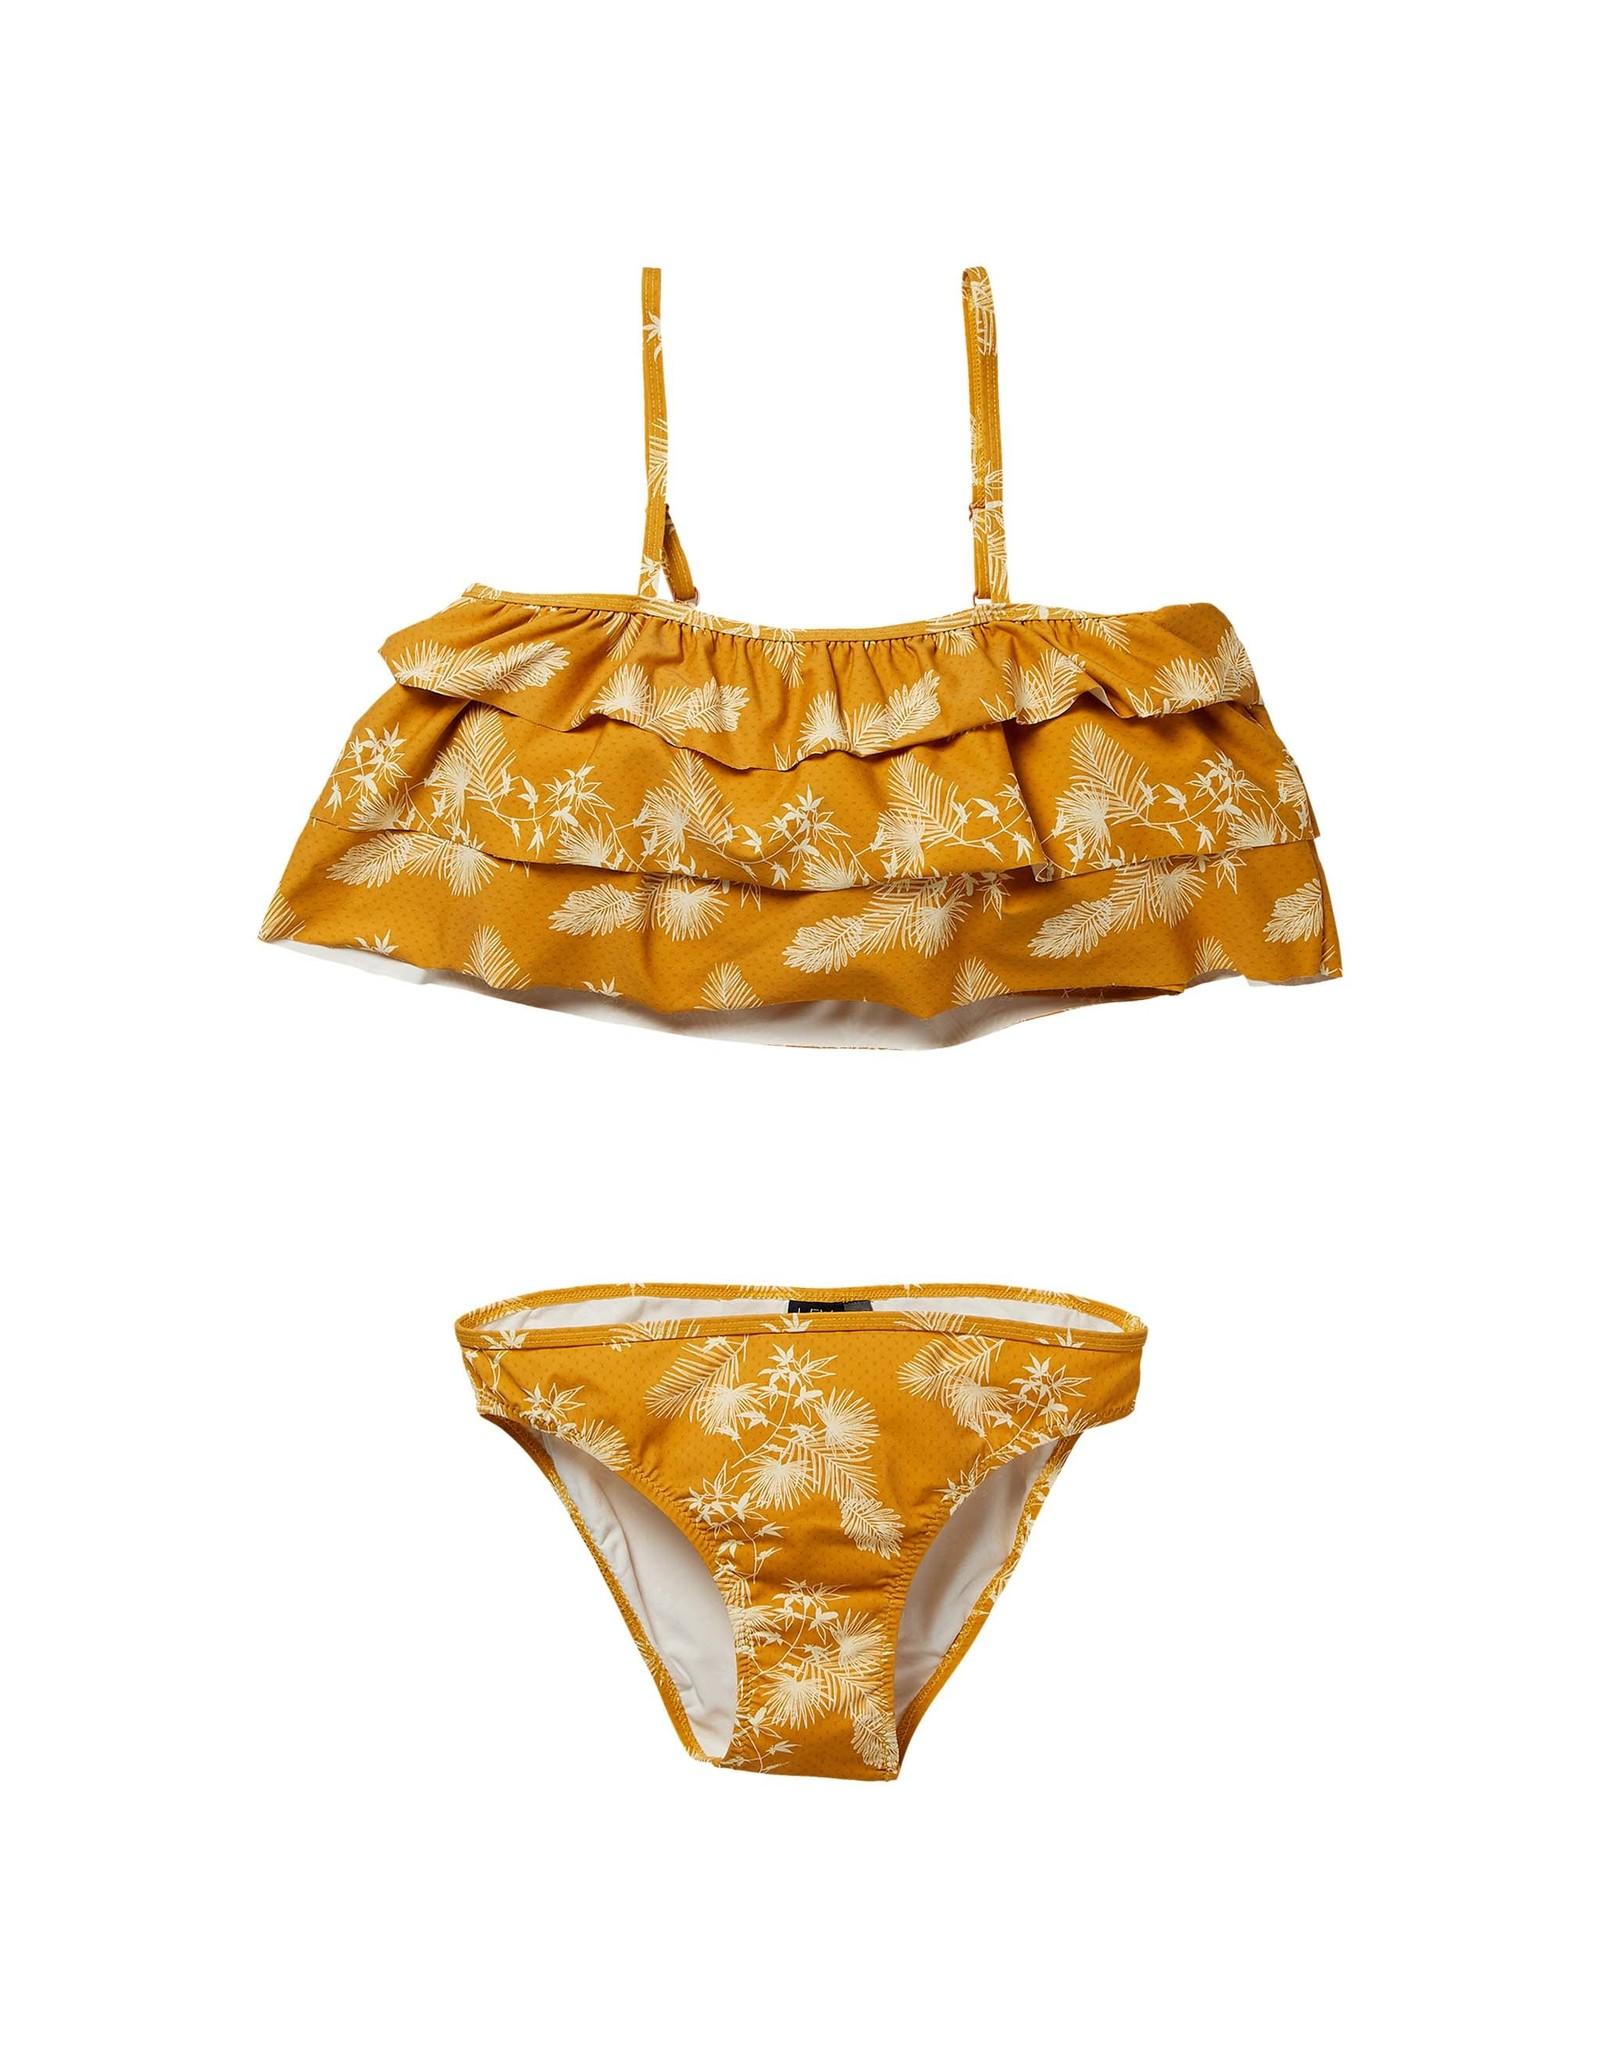 LEVV Levv meisjes bikini Nanne Mustard Leaves